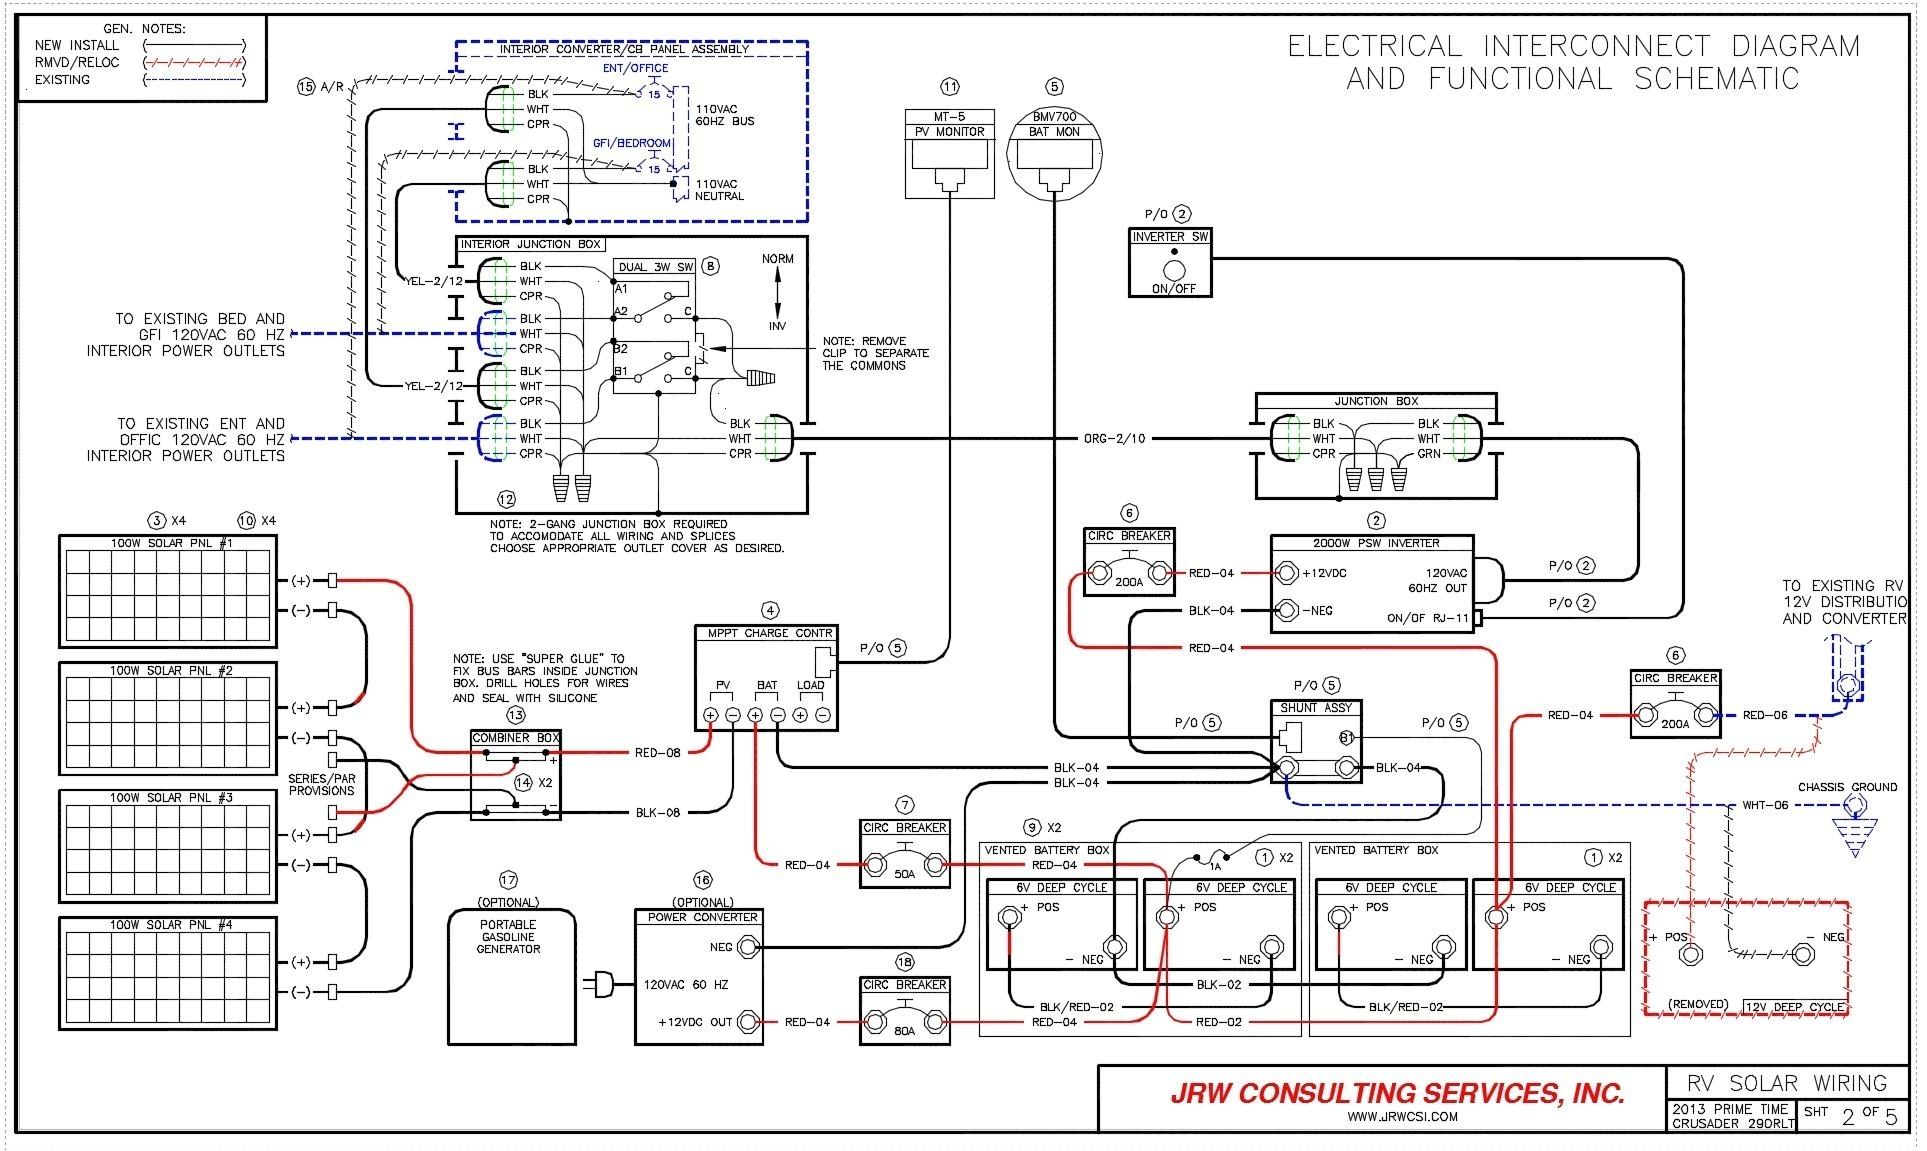 rv park wiring diagram free picture schematic wiring diagram go rv park wiring diagram